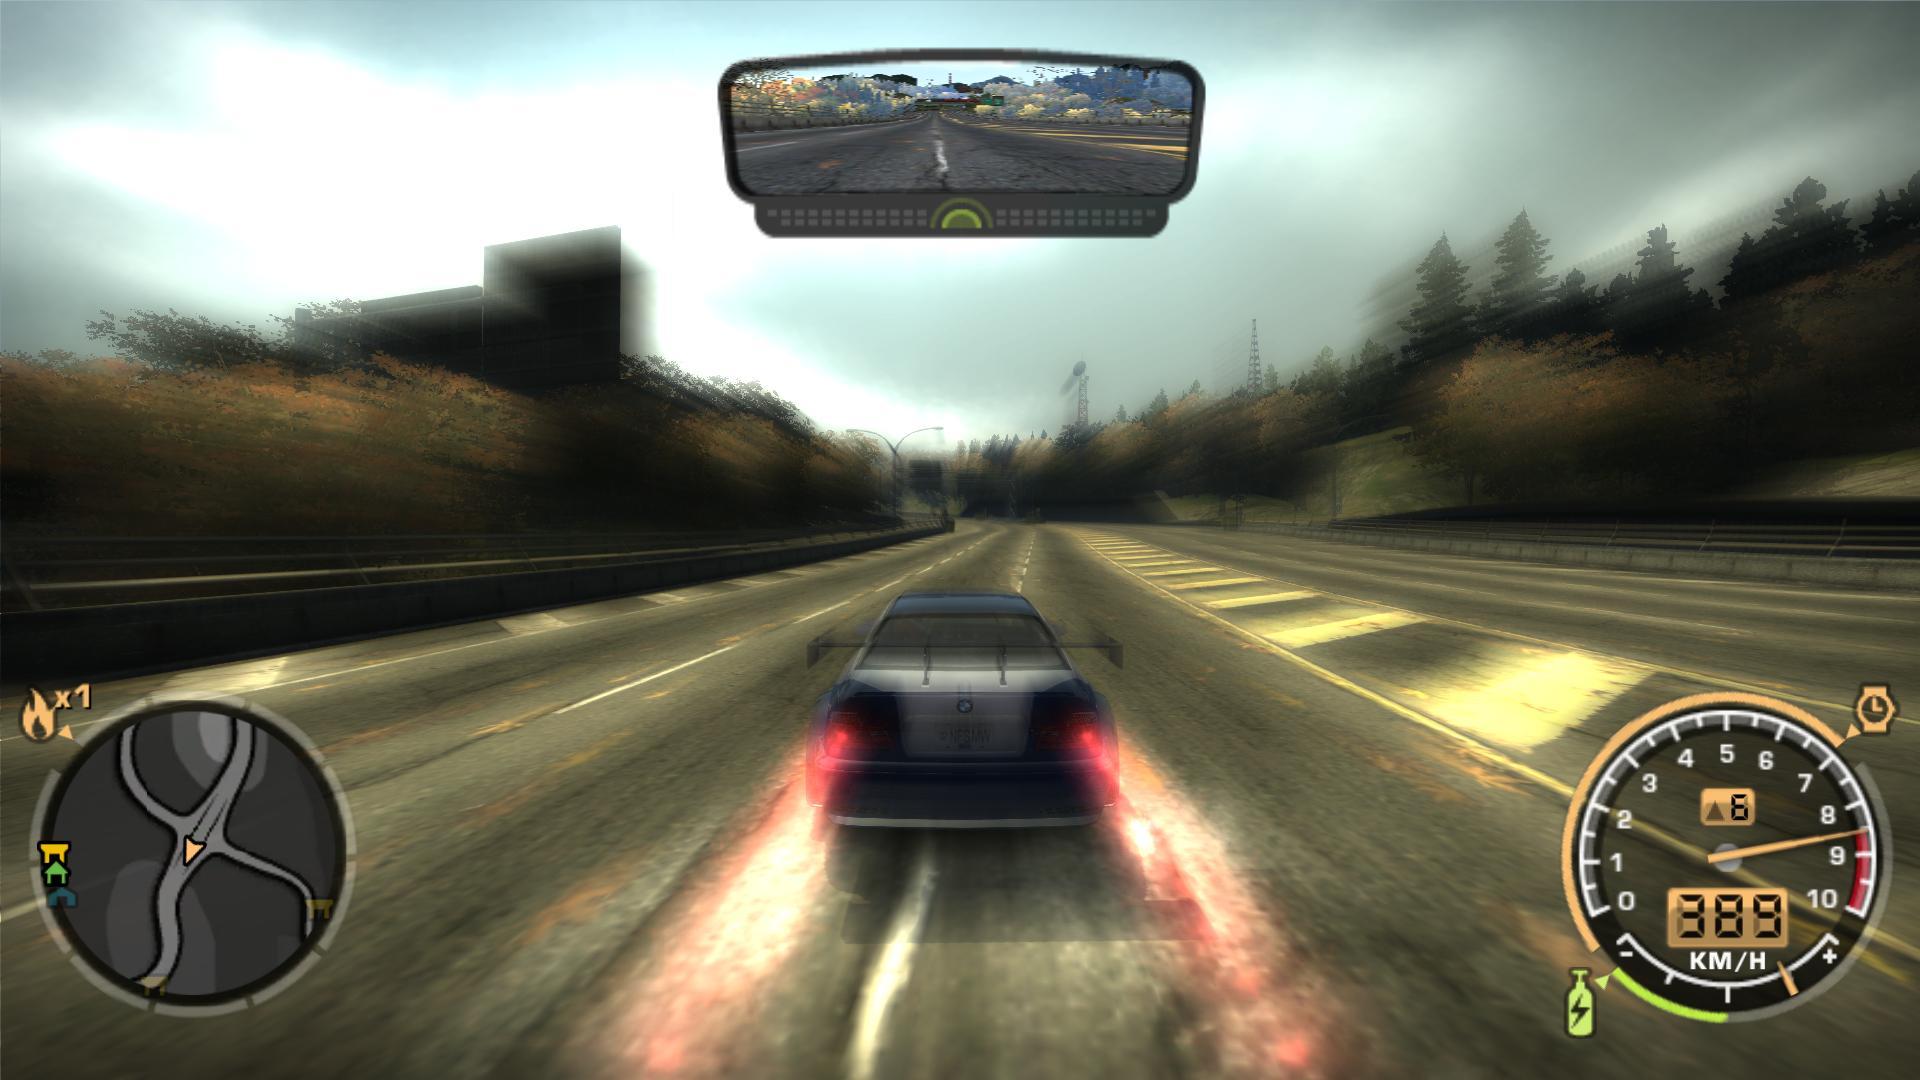 NFSMods - Upgradeable BMW M3 GTR E46 (Race)